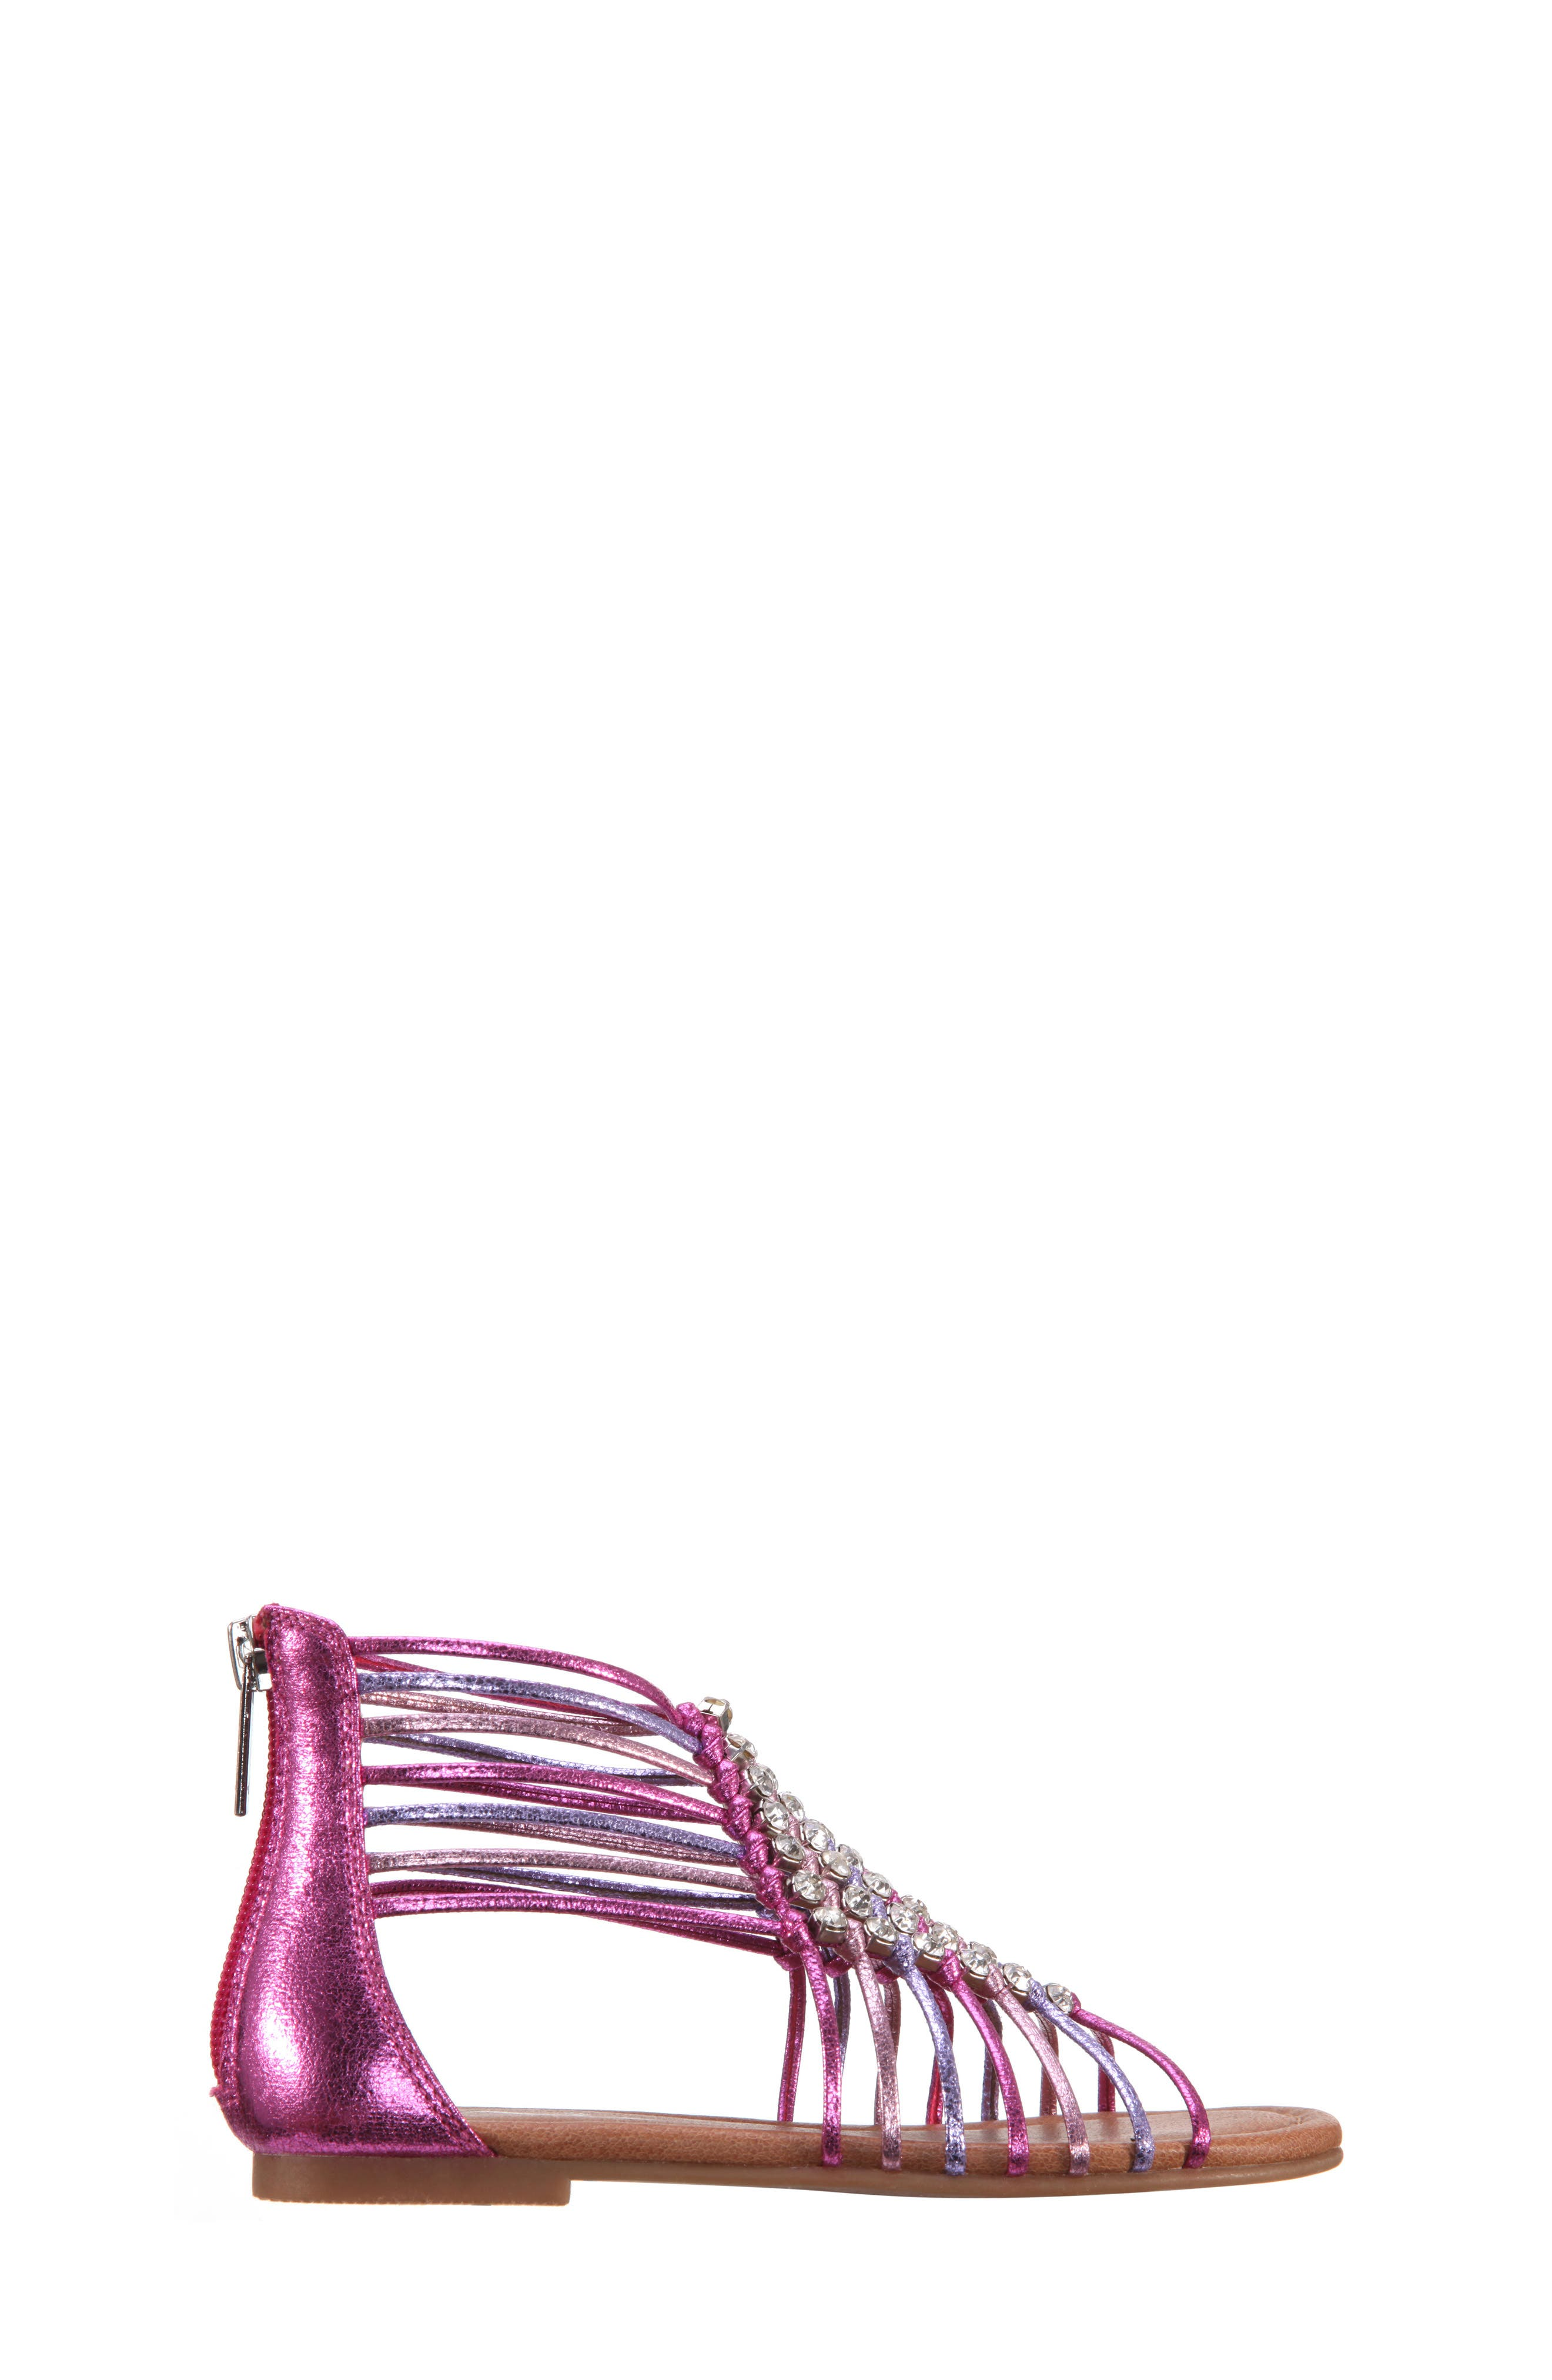 Karlee Embellished Sandal,                             Alternate thumbnail 3, color,                             Pink Multi Metallic Crackle